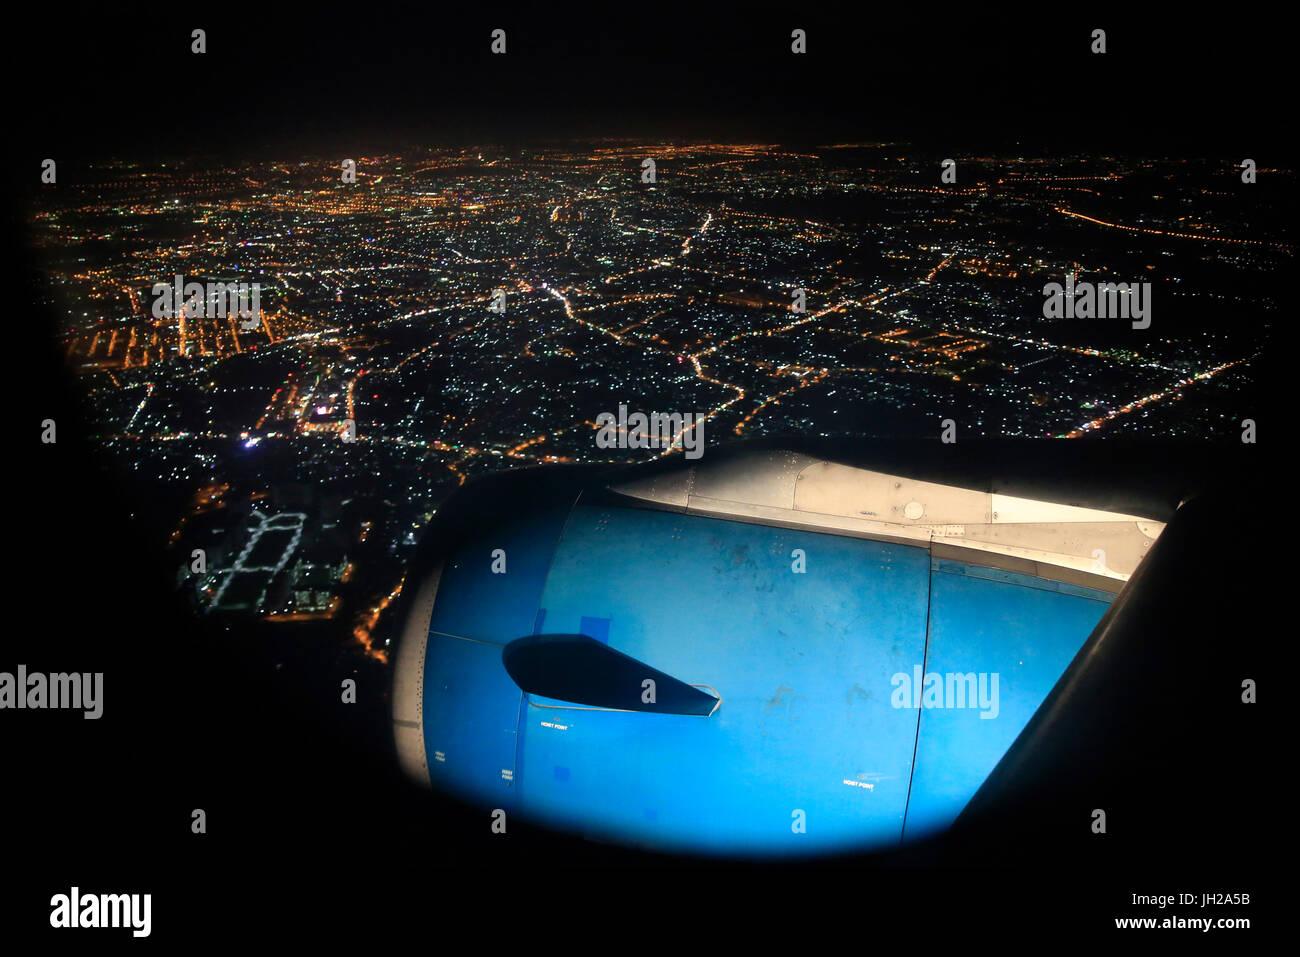 Vietnam Airlines. Airbus A321 landing at Tan Son Nhat International Airport. Ho Chi Minh City. Vietnam. - Stock Image